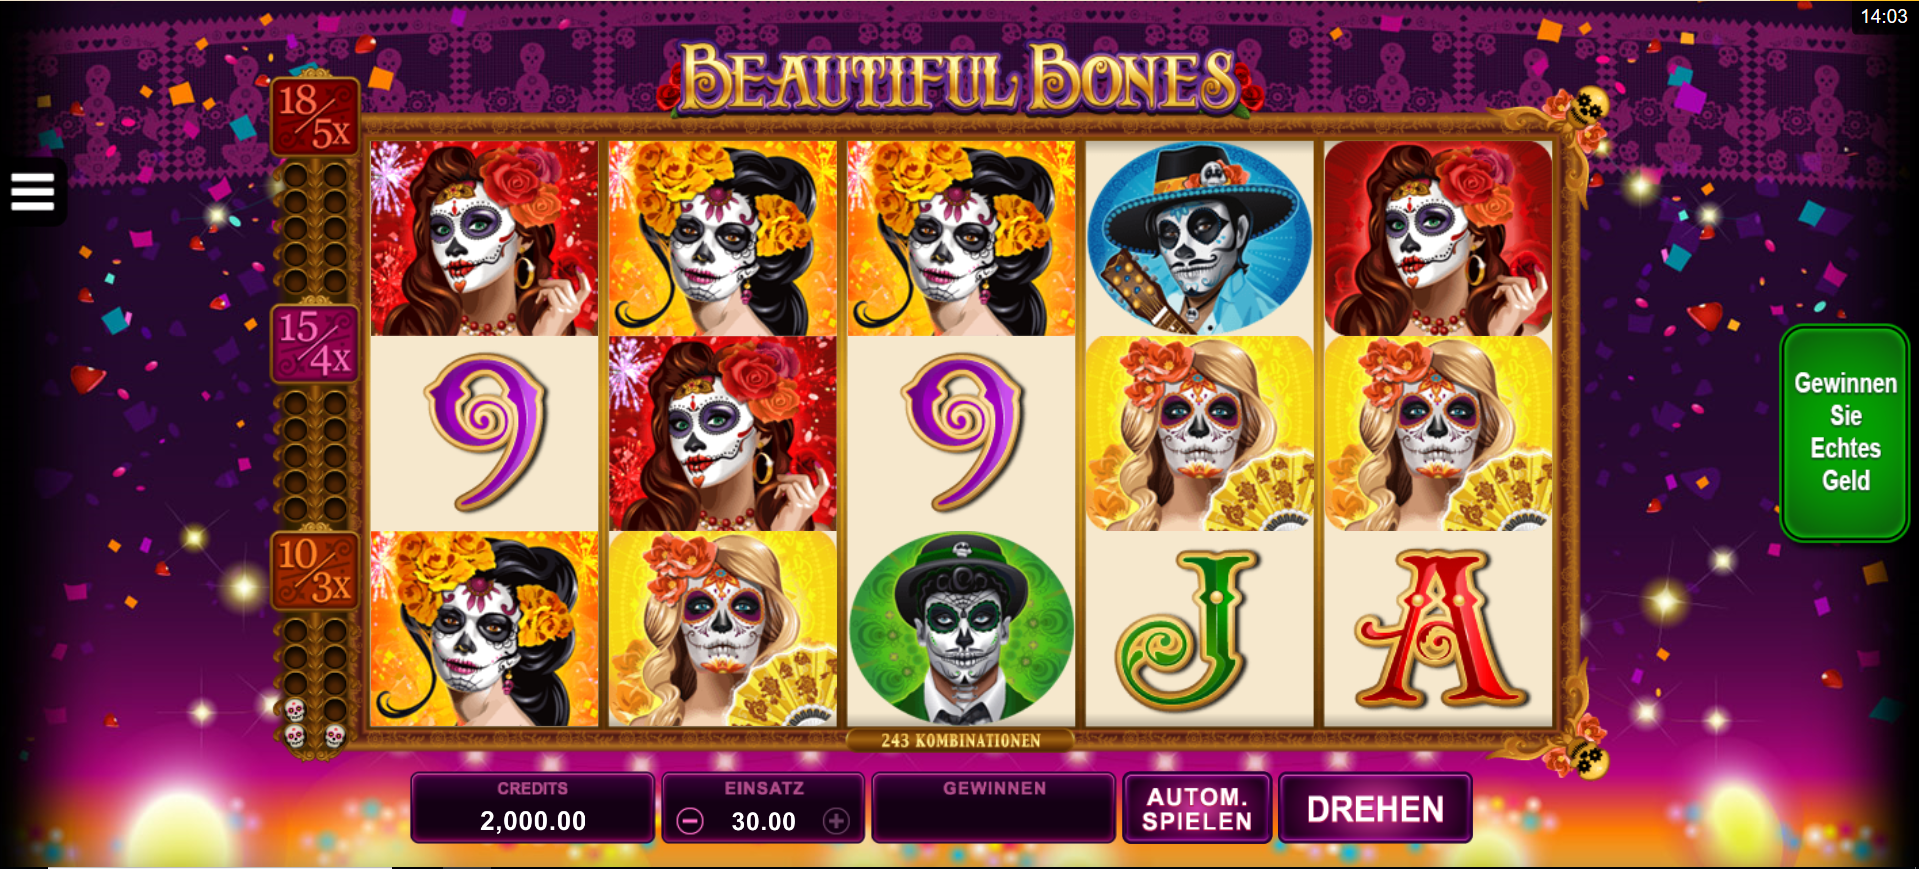 www casino kino aschaffenburg de